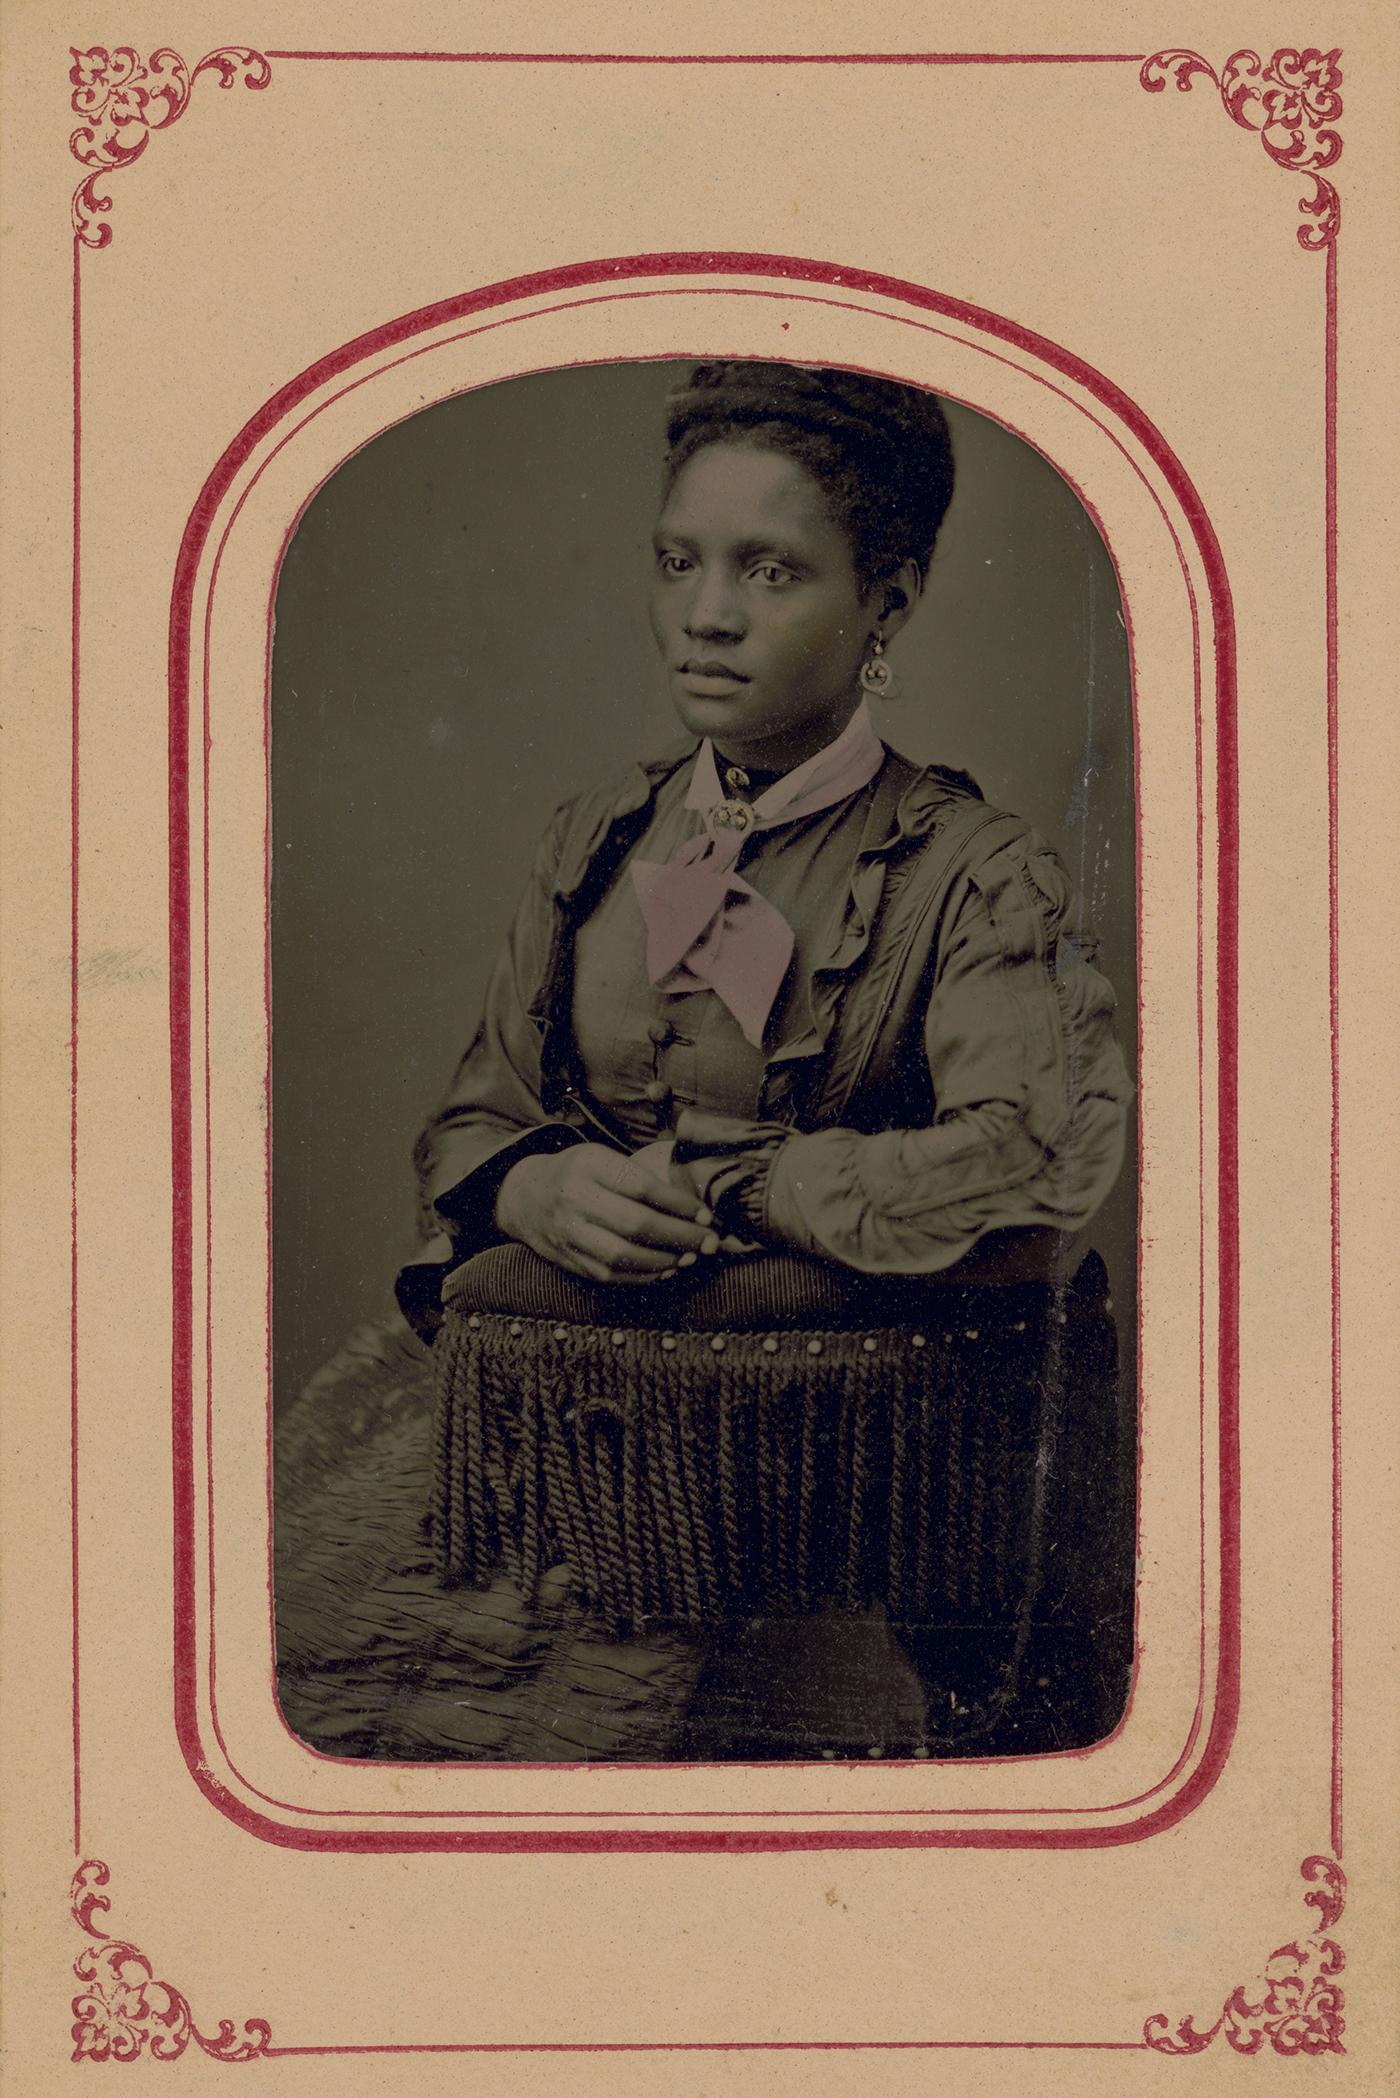 Library of Congress, African American History, Black History, Black Memorabilia, KOLUMN Magazine, KOLUMN